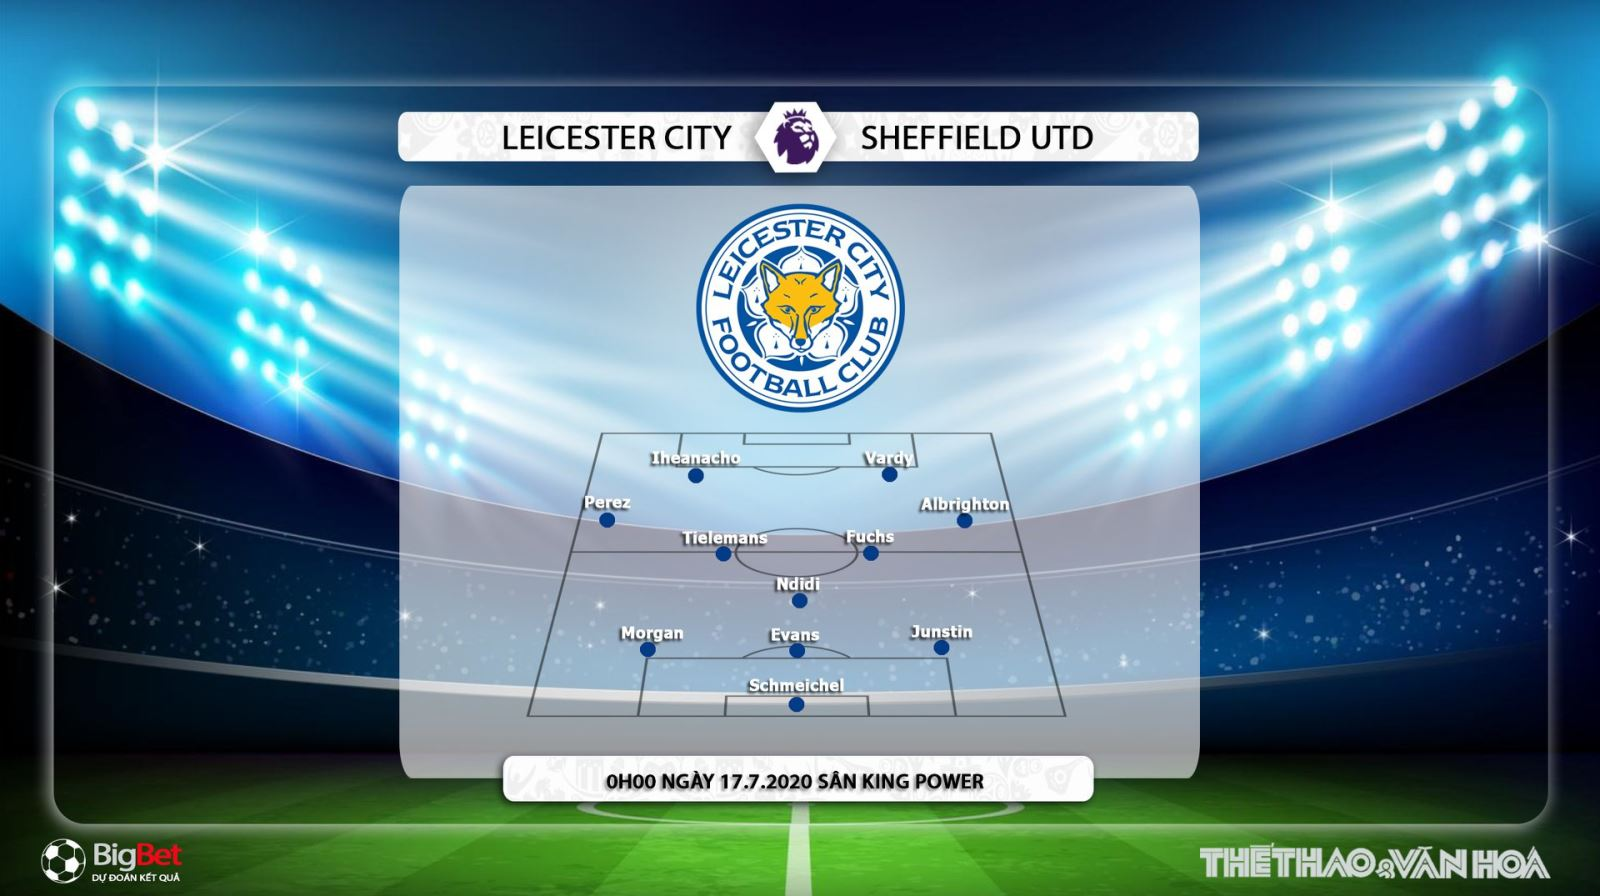 Leicester vs Sheffield Utd, Leicester, Sheffield, soi kèo Leicester vs Sheffield Utd, trực tiếp Leicester vs Sheffield Utd, nhận định, dự đoán